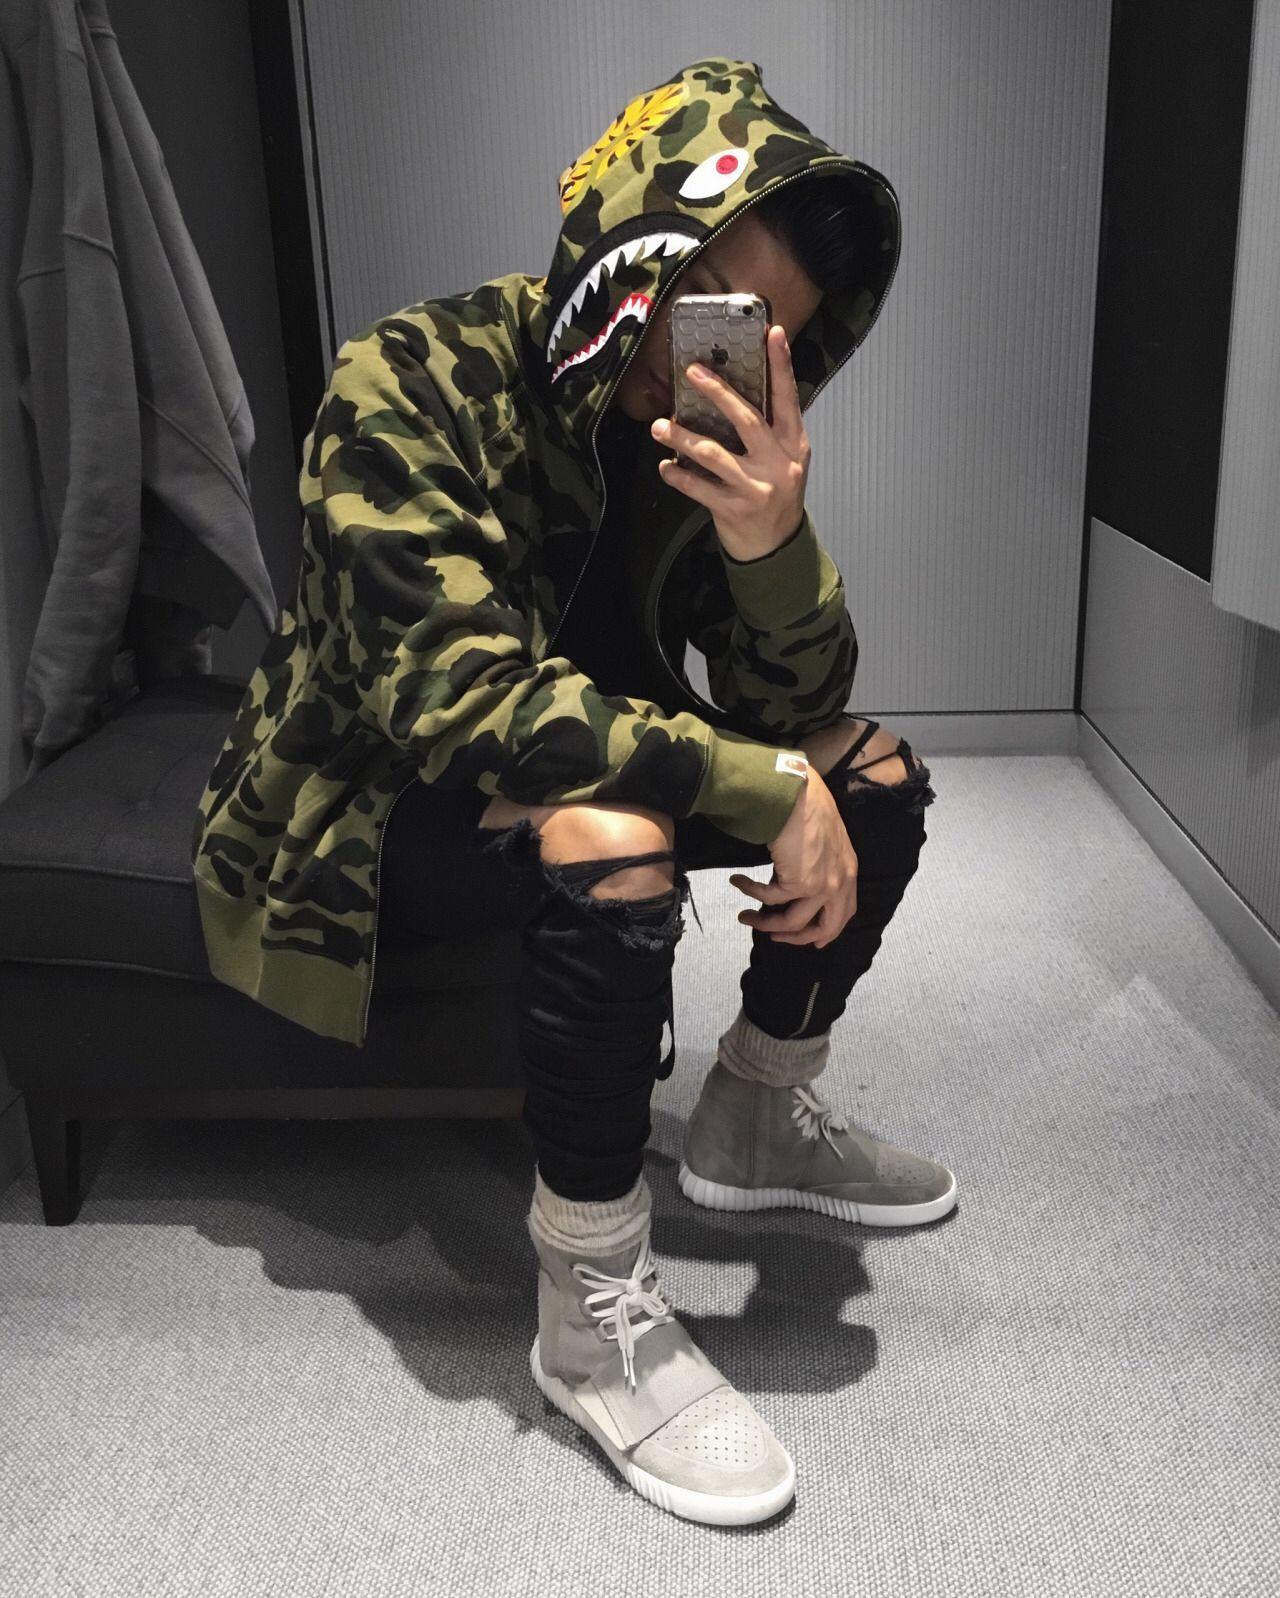 Ultramoderne Killa bape | Camomeleon in 2019 | Bape outfits, Streetwear fashion GV-27